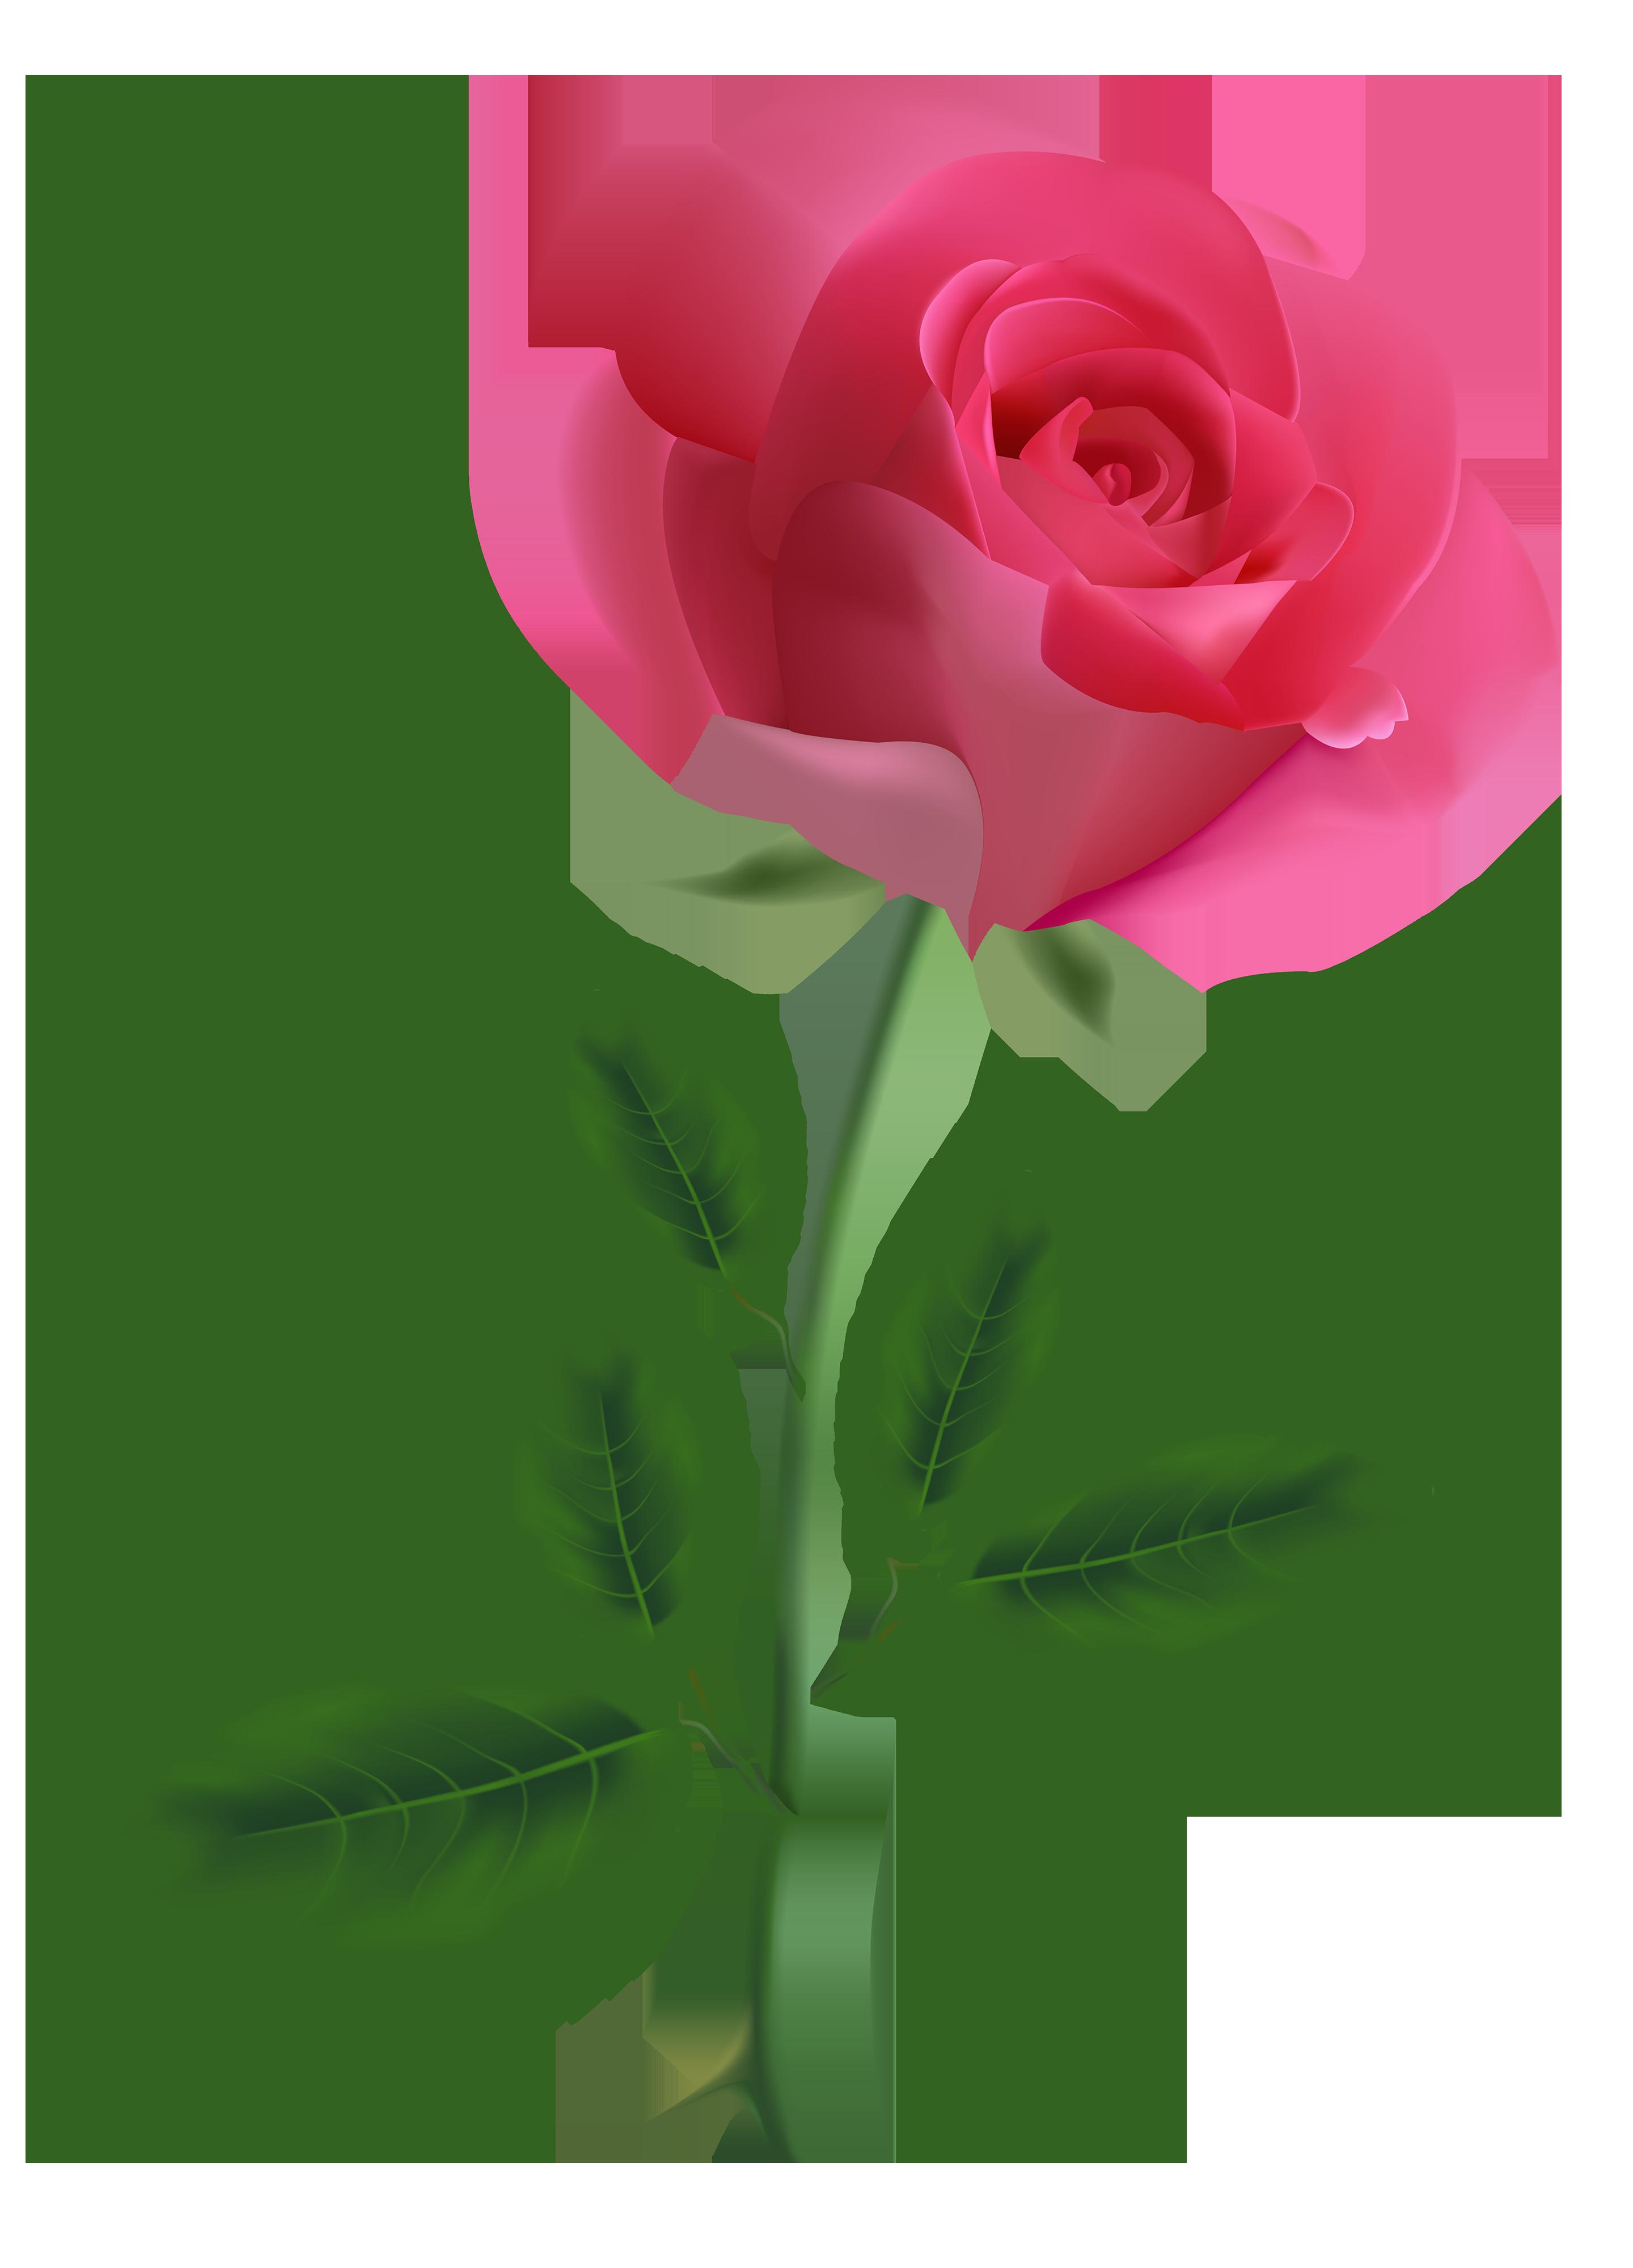 Christmas rose clipart picture transparent Pink Rose Clipart PNG Image - Best WEB Clipart picture transparent